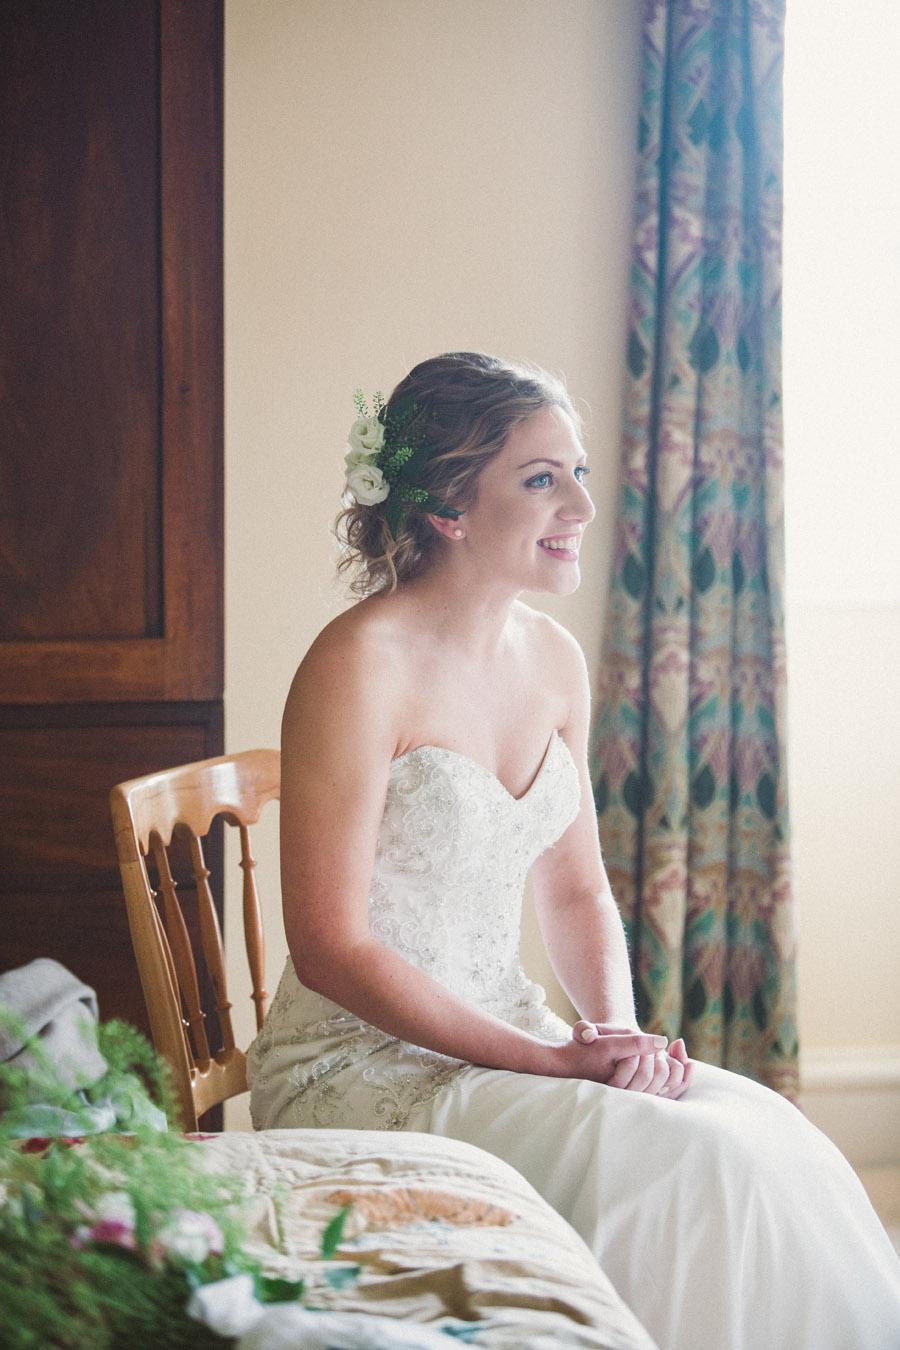 wildflowers wedding in devon, image credit Emma Stoner Photography (14)